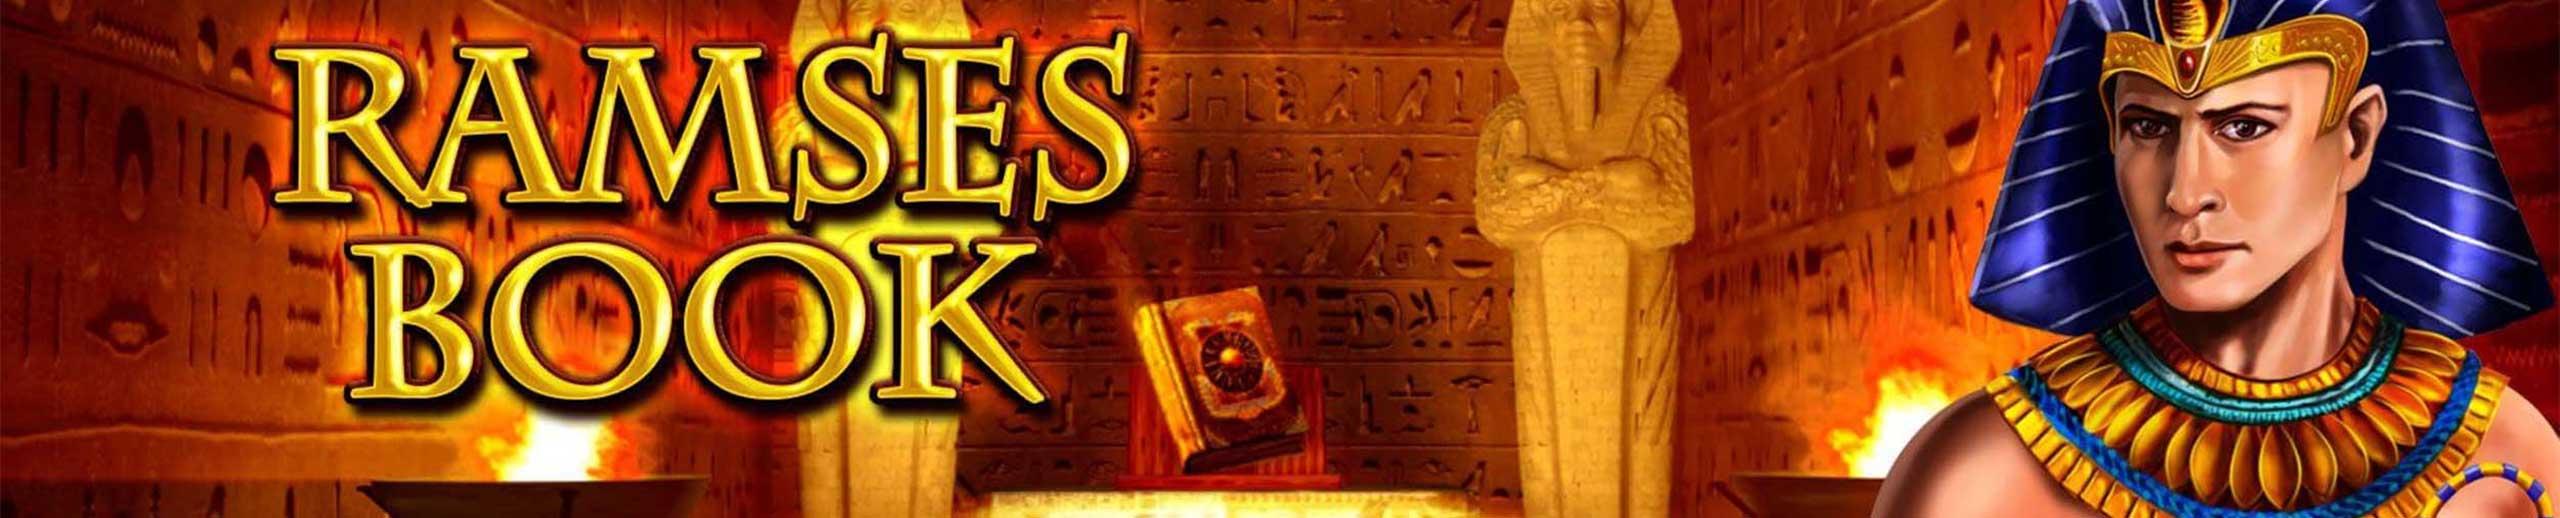 Ramses-Book-Gamomat-Spielautomat